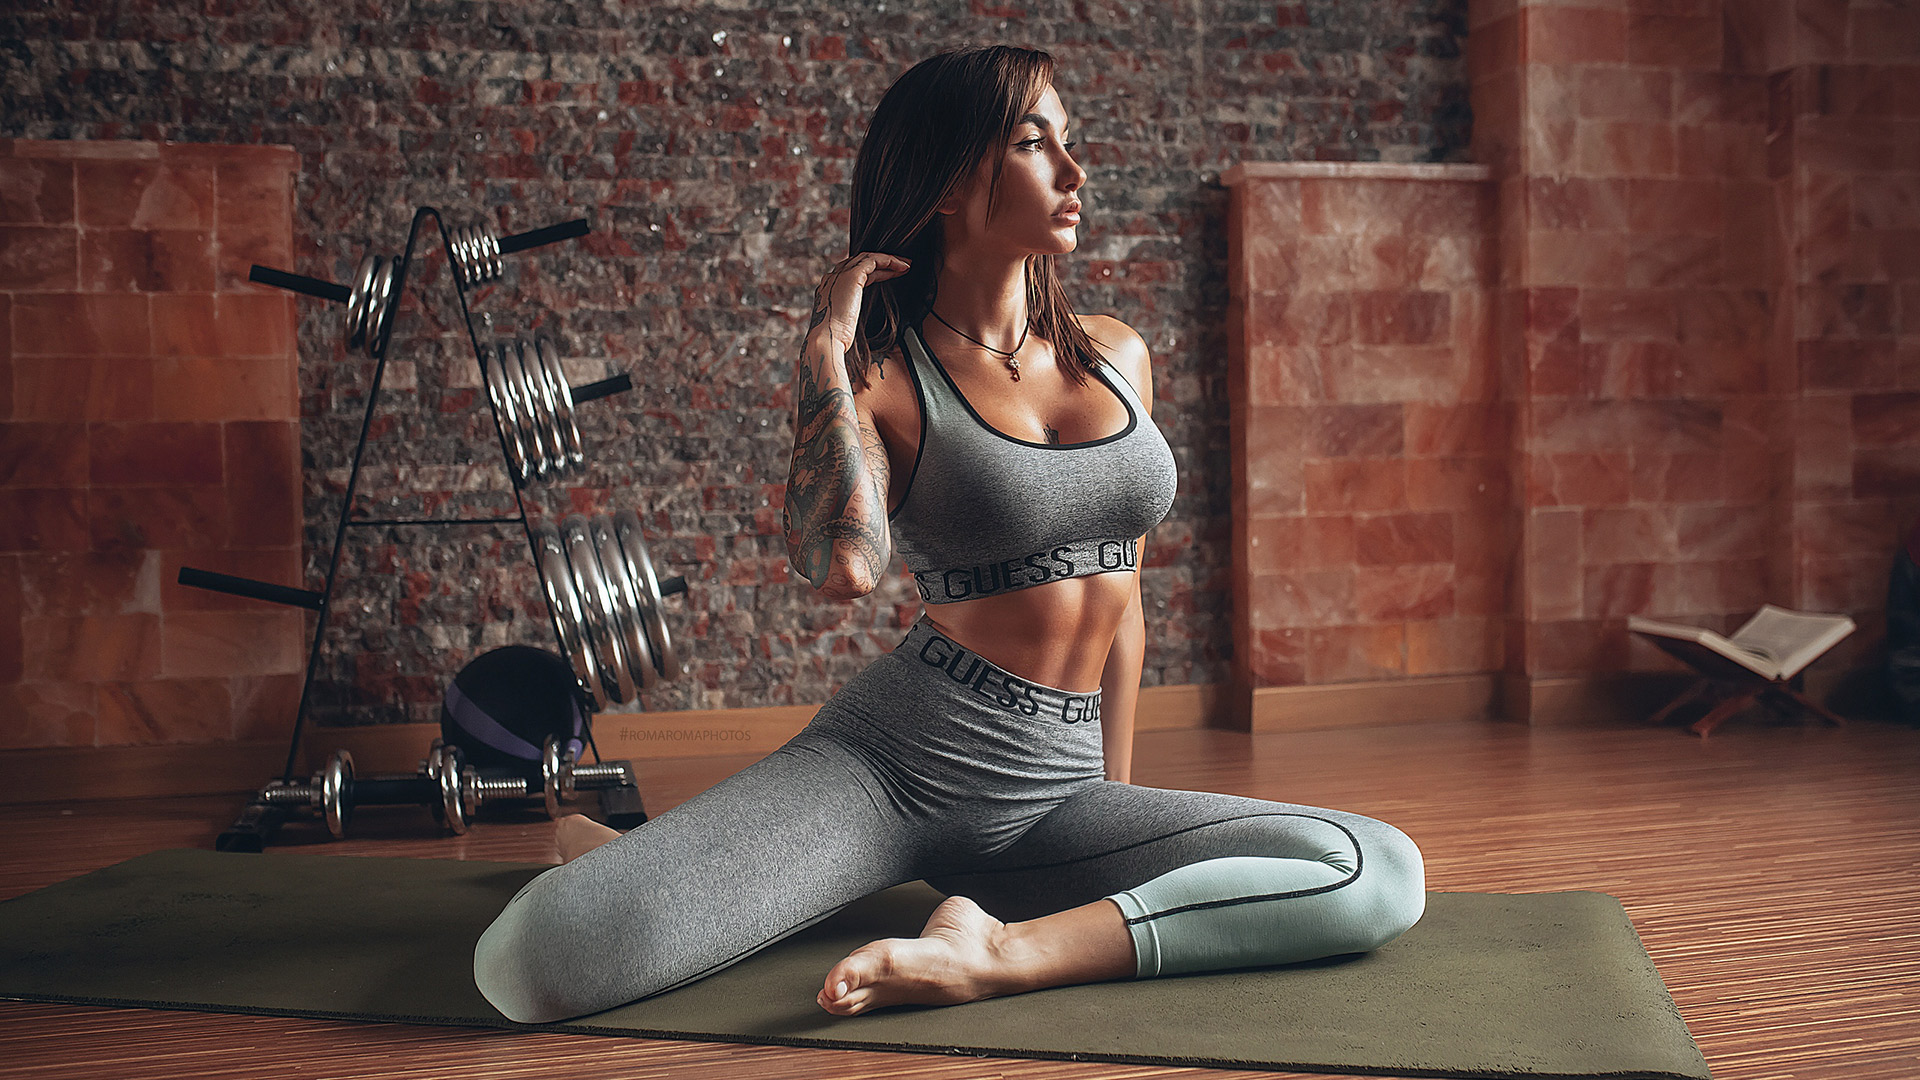 Yoga fitness hd image